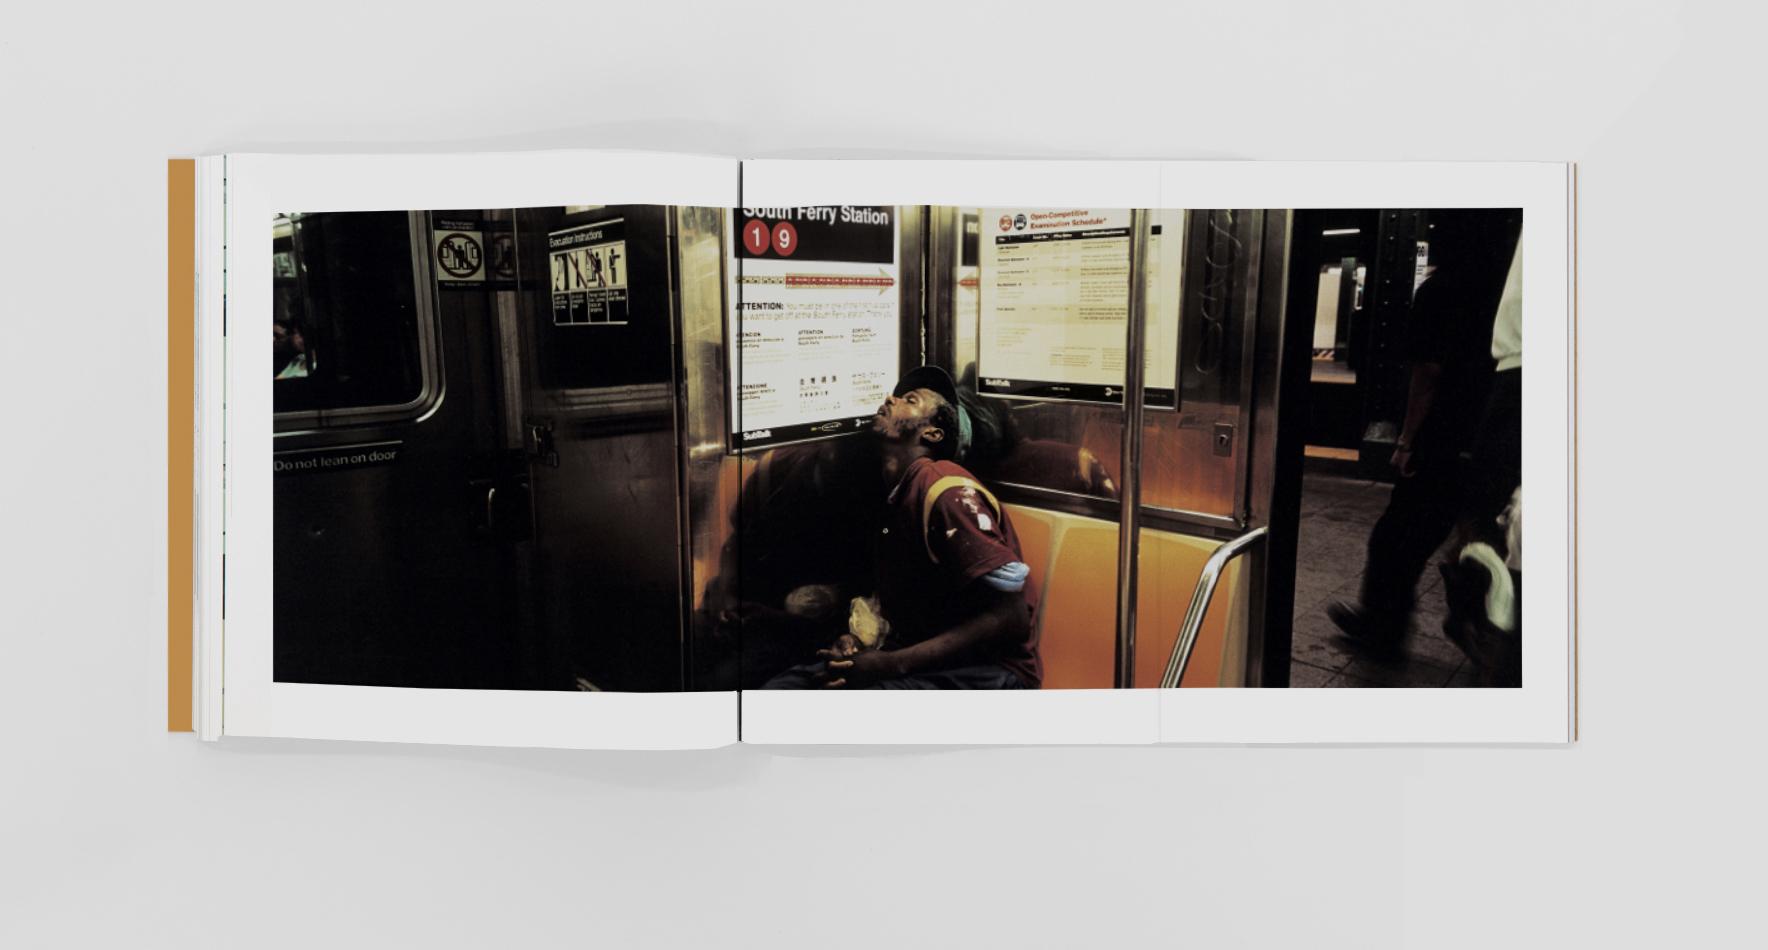 newyork_website_panoramica_01 copia.jpg